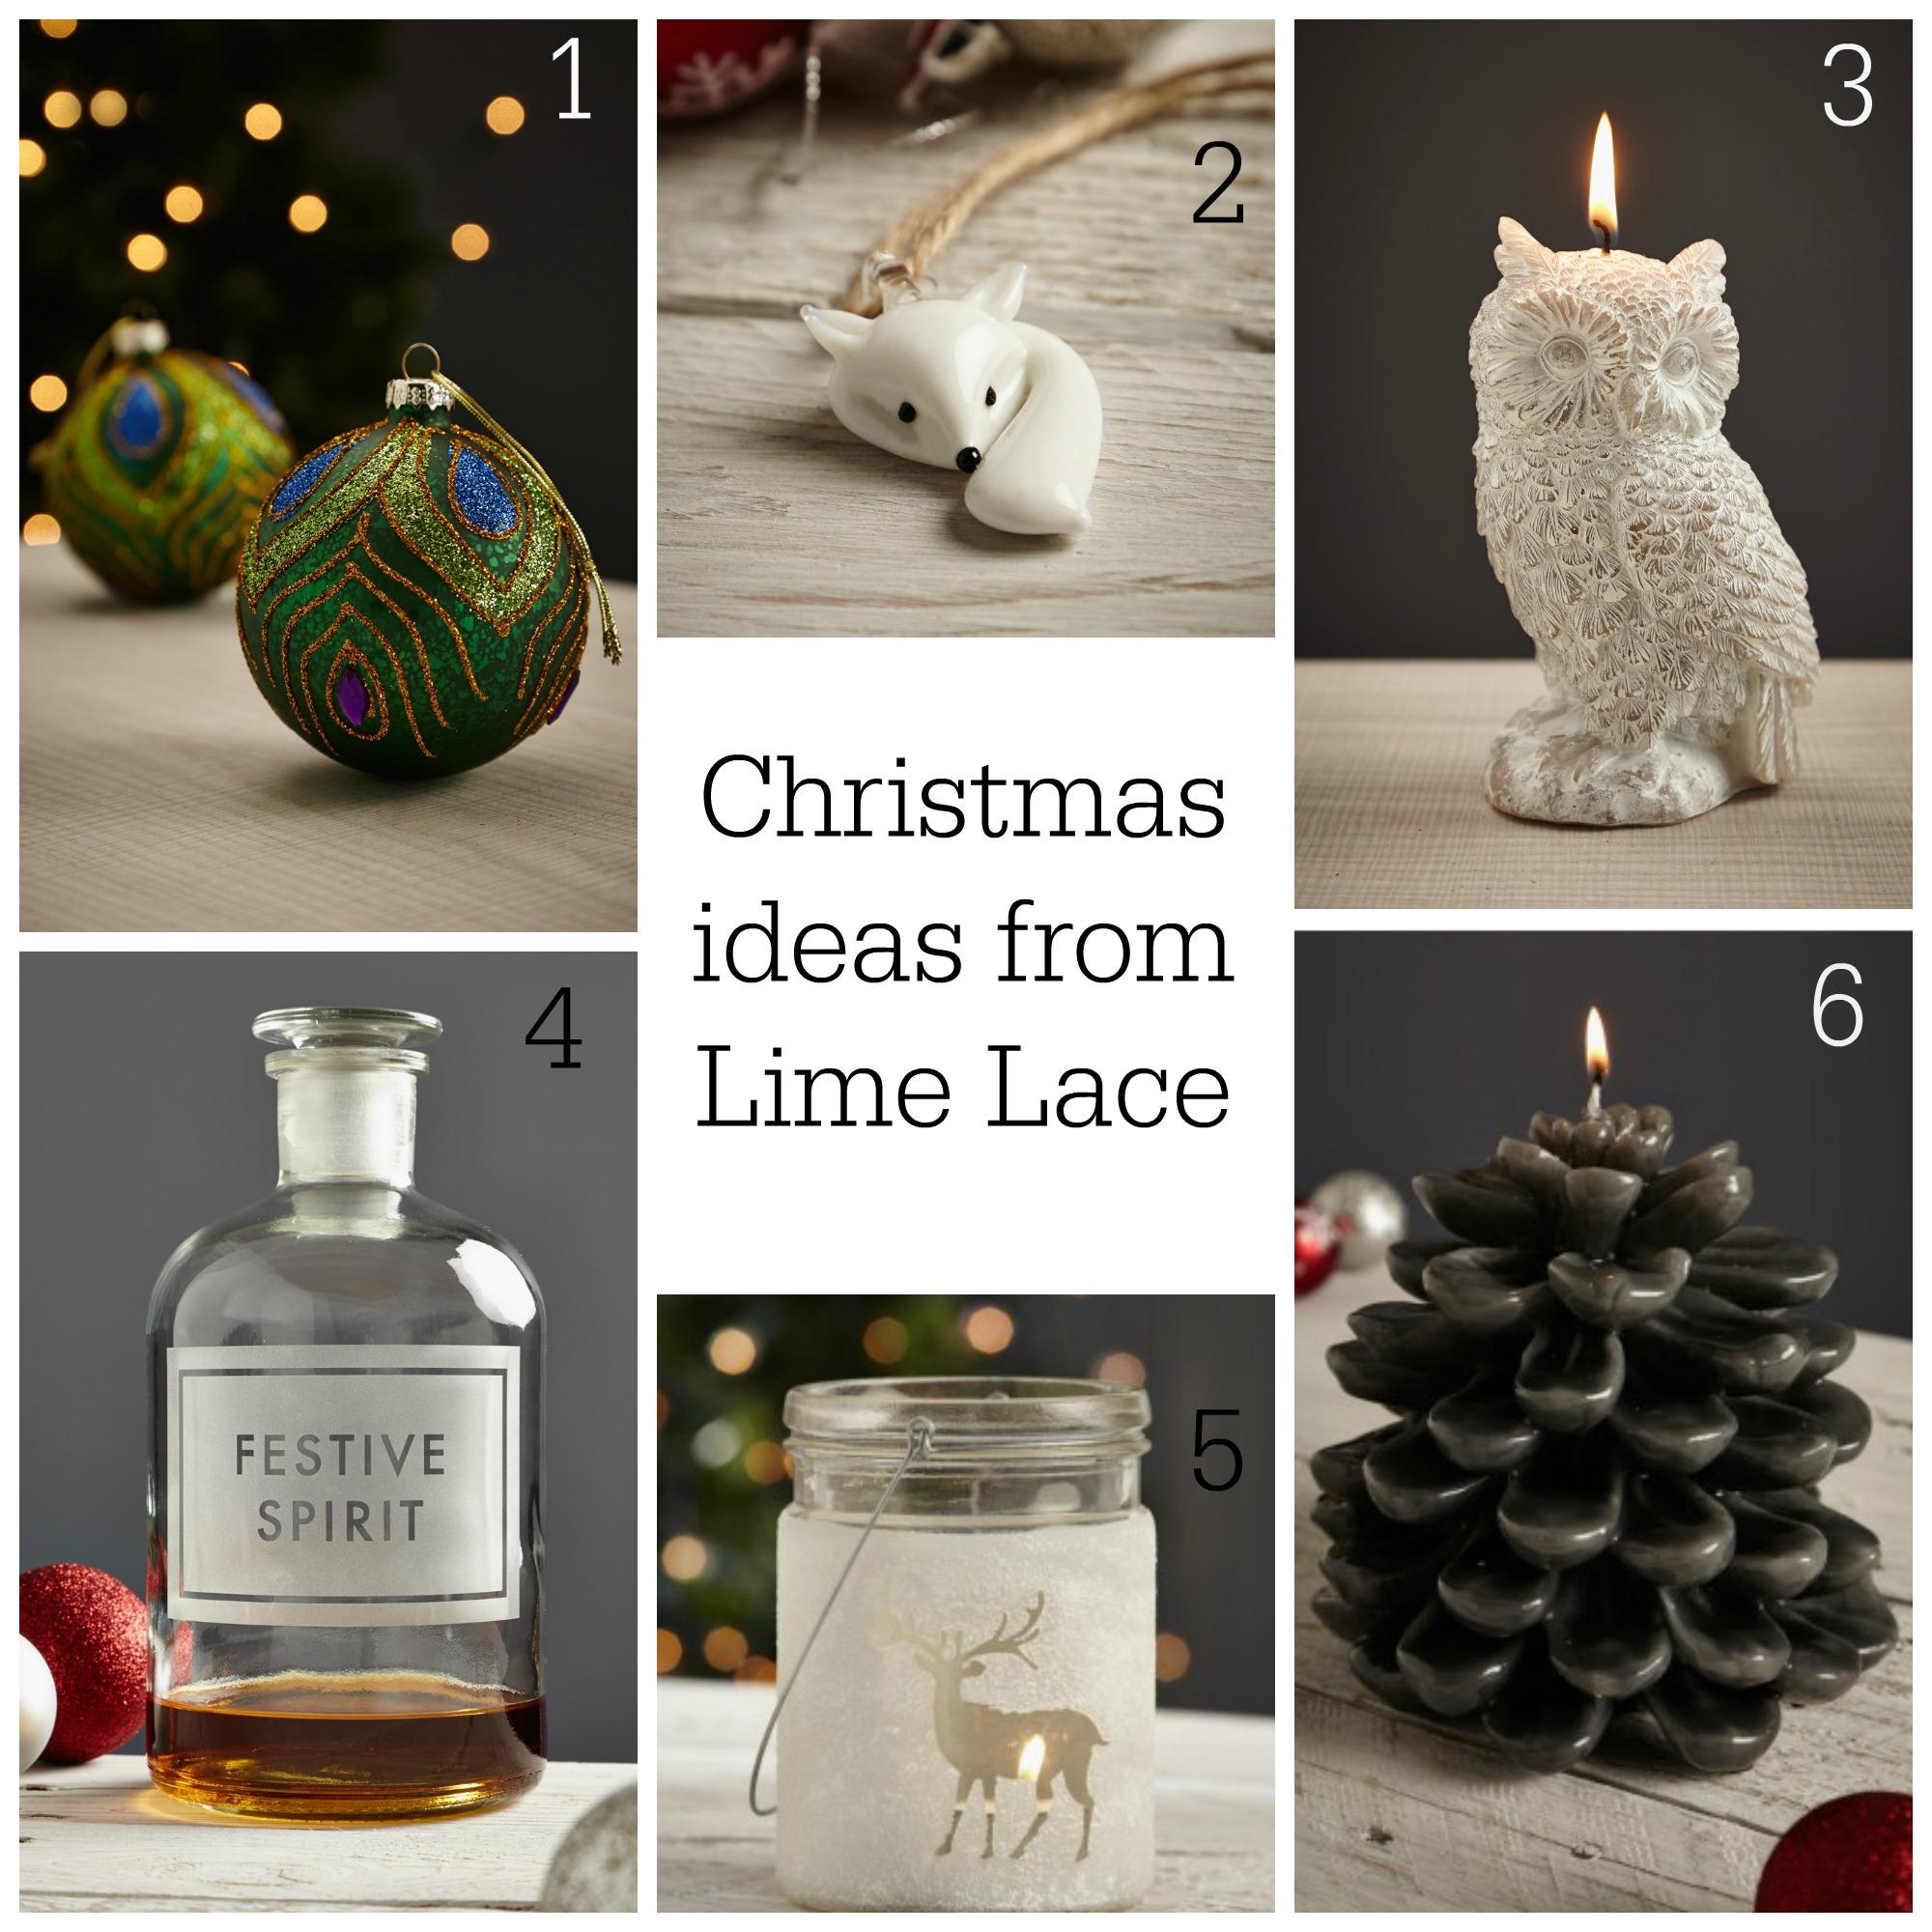 Christmas Decor Gift Ideas Lime